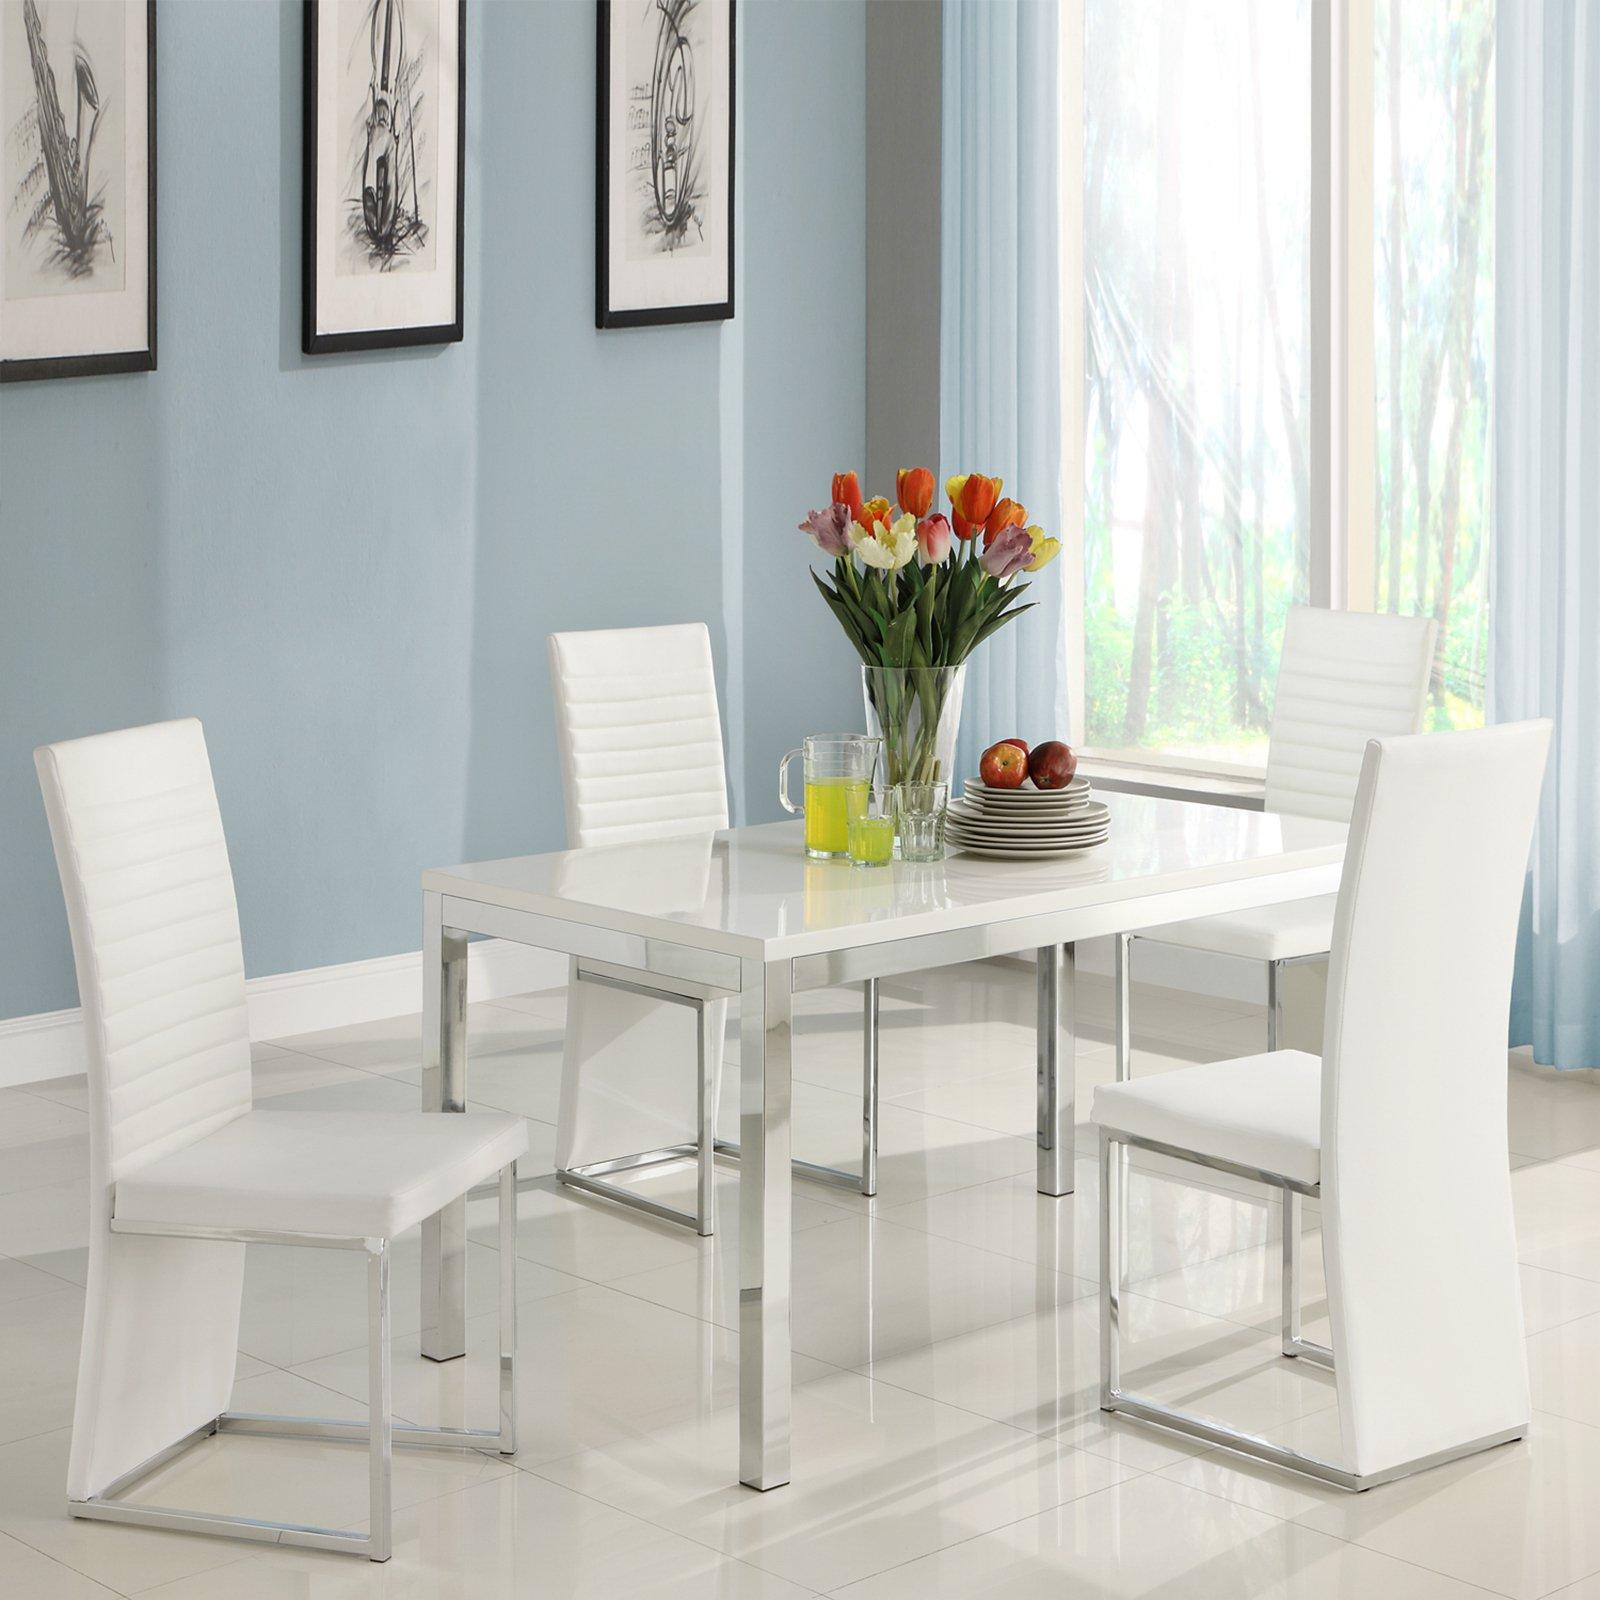 homelegance clarice 5-piece chrome dining table set - modern white